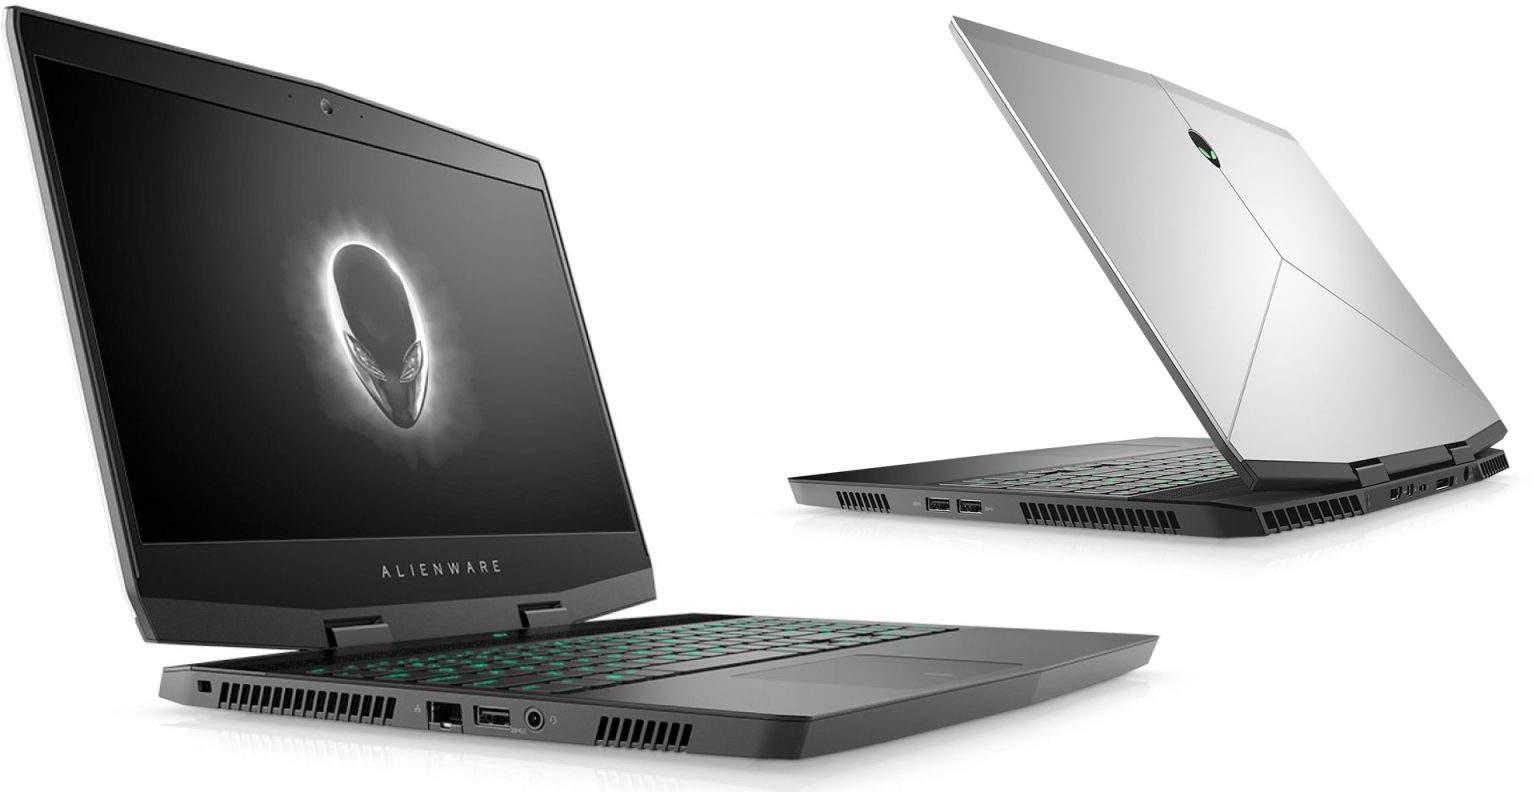 Купить Ноутбук Dell Alienware M15 (M15-5515) фото 3